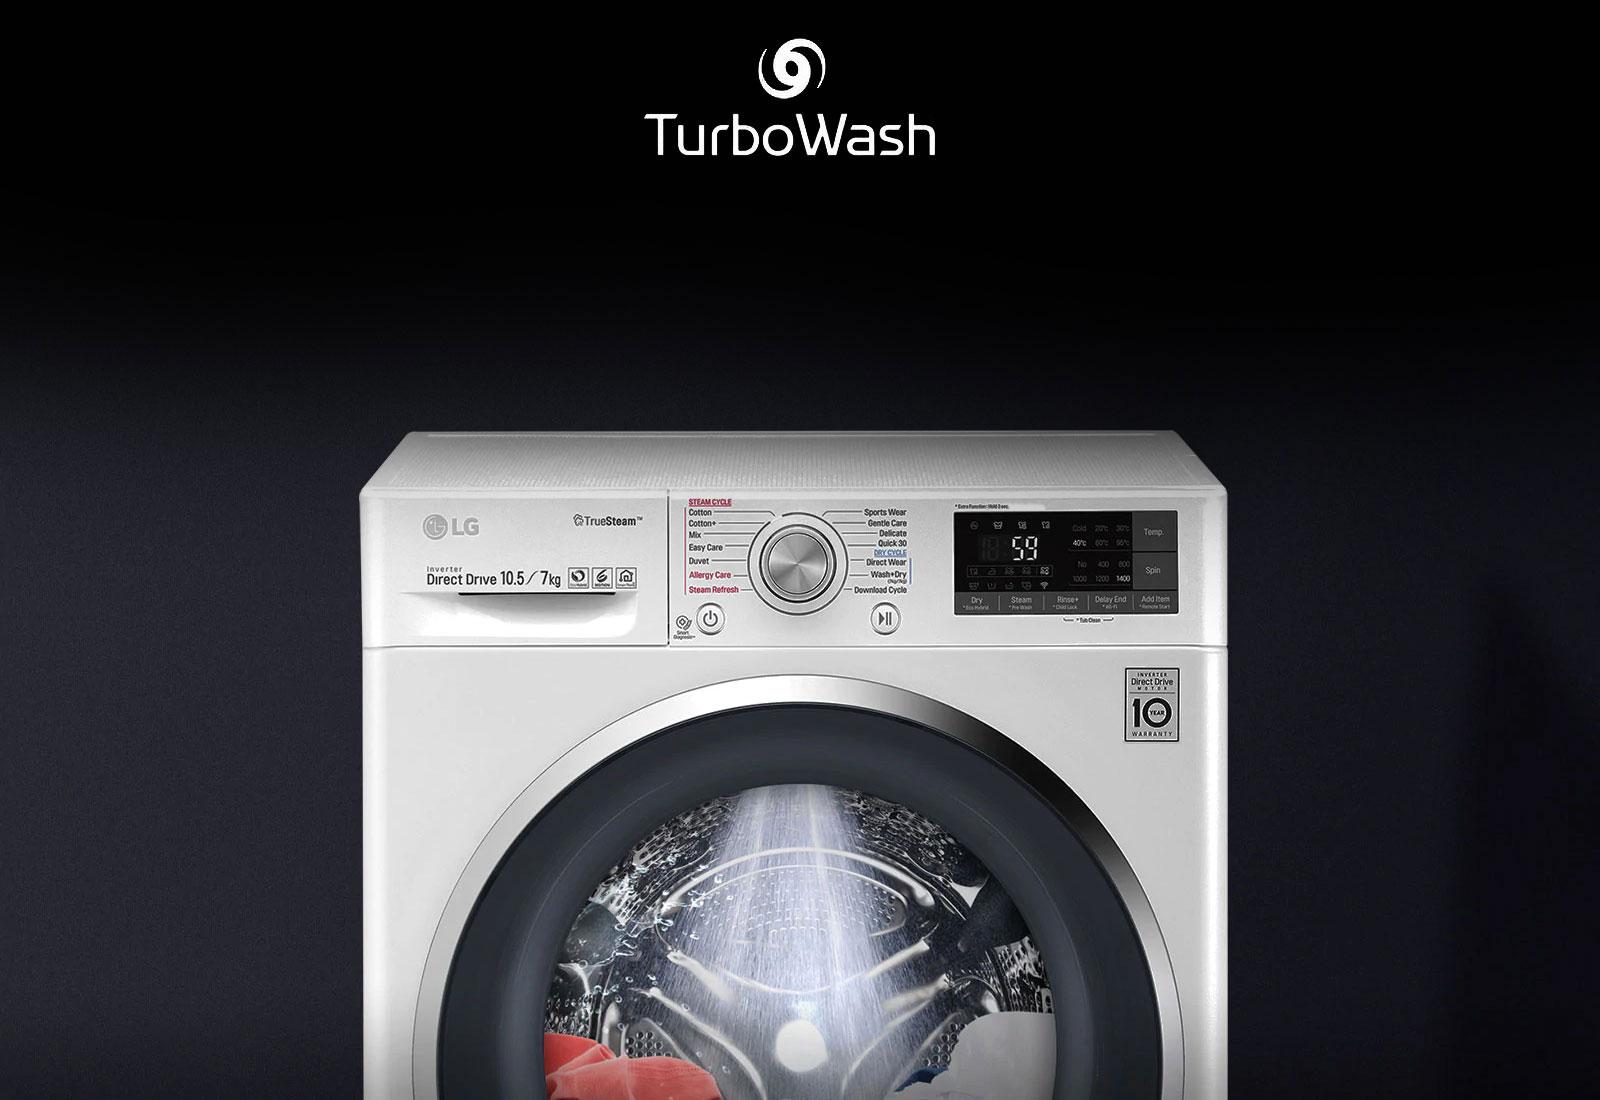 LG FHV1408ZWB Turbo Wash